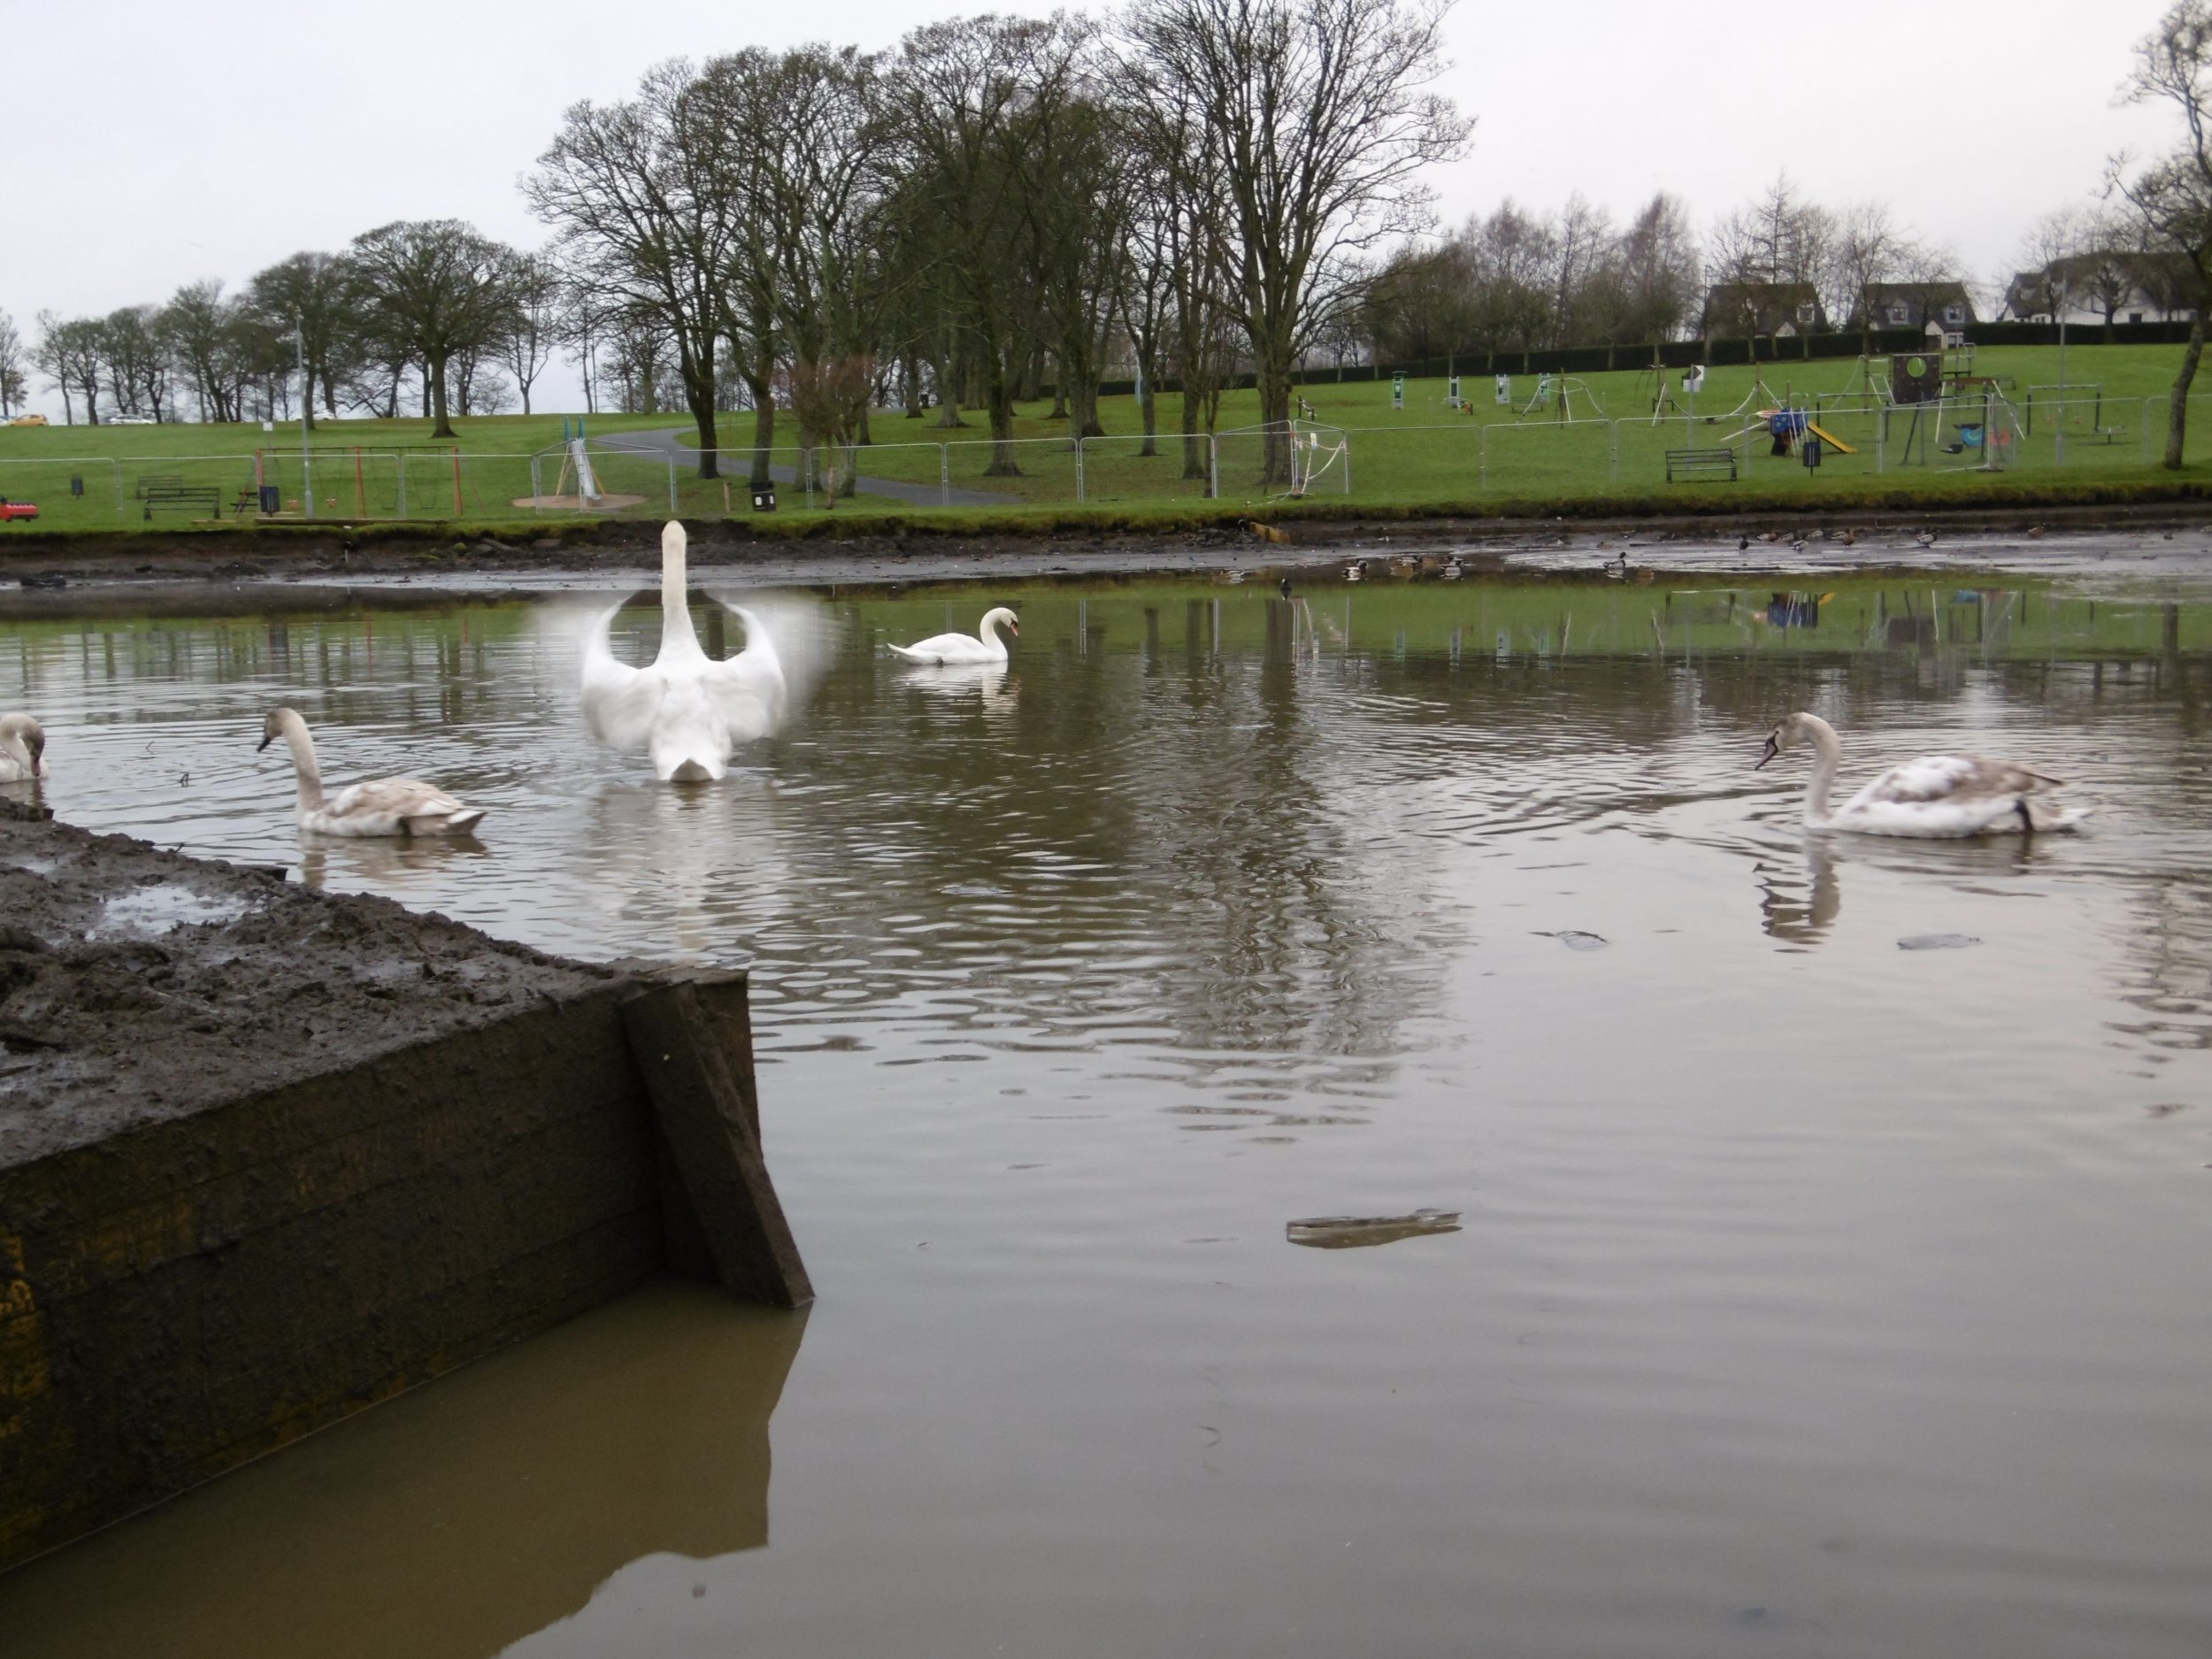 Swans in Kay Park